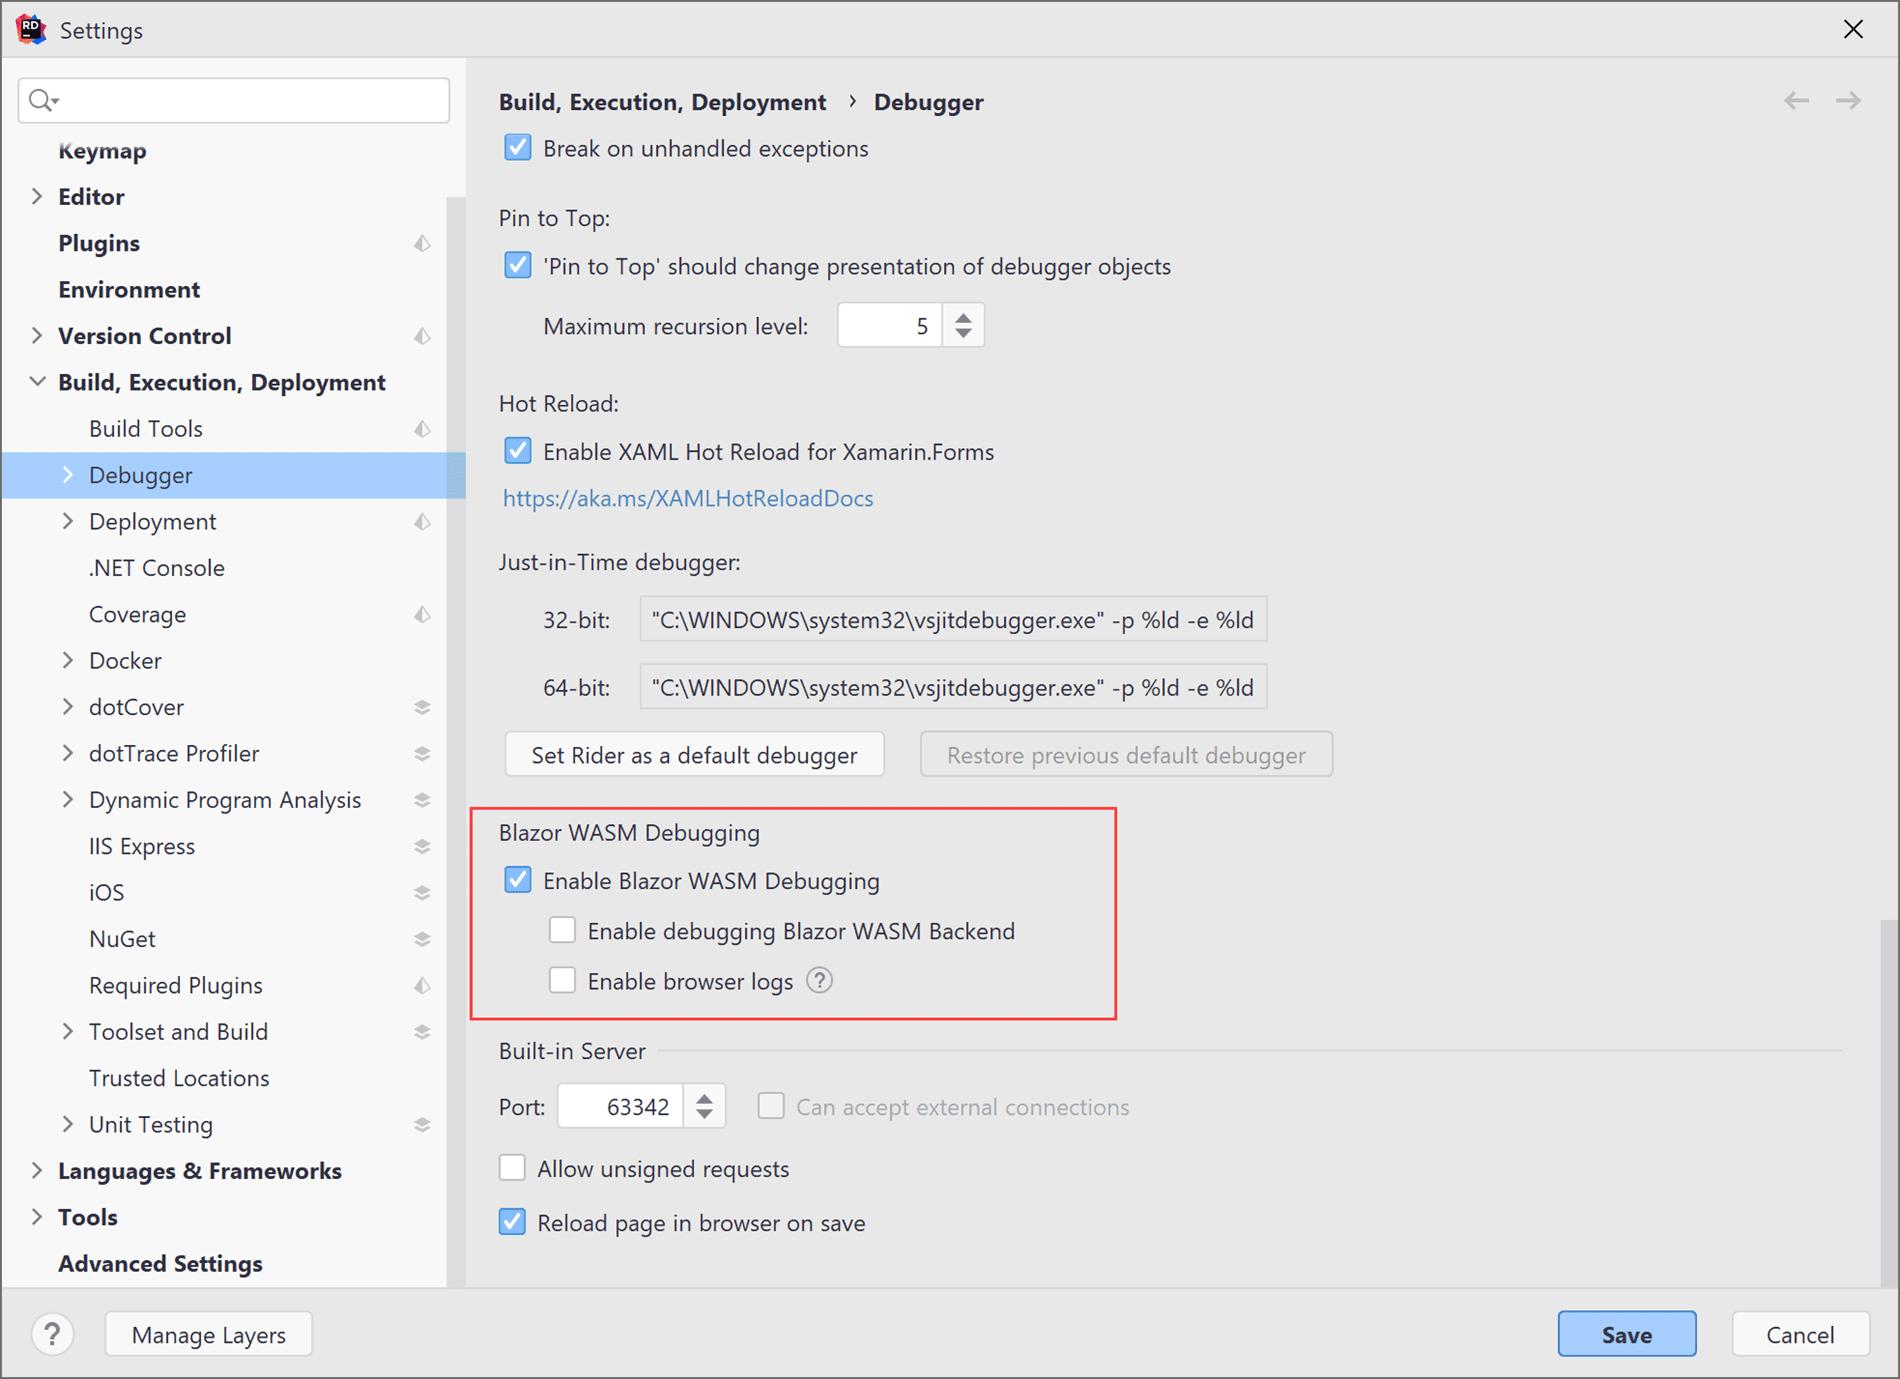 Settings for WASM debugging